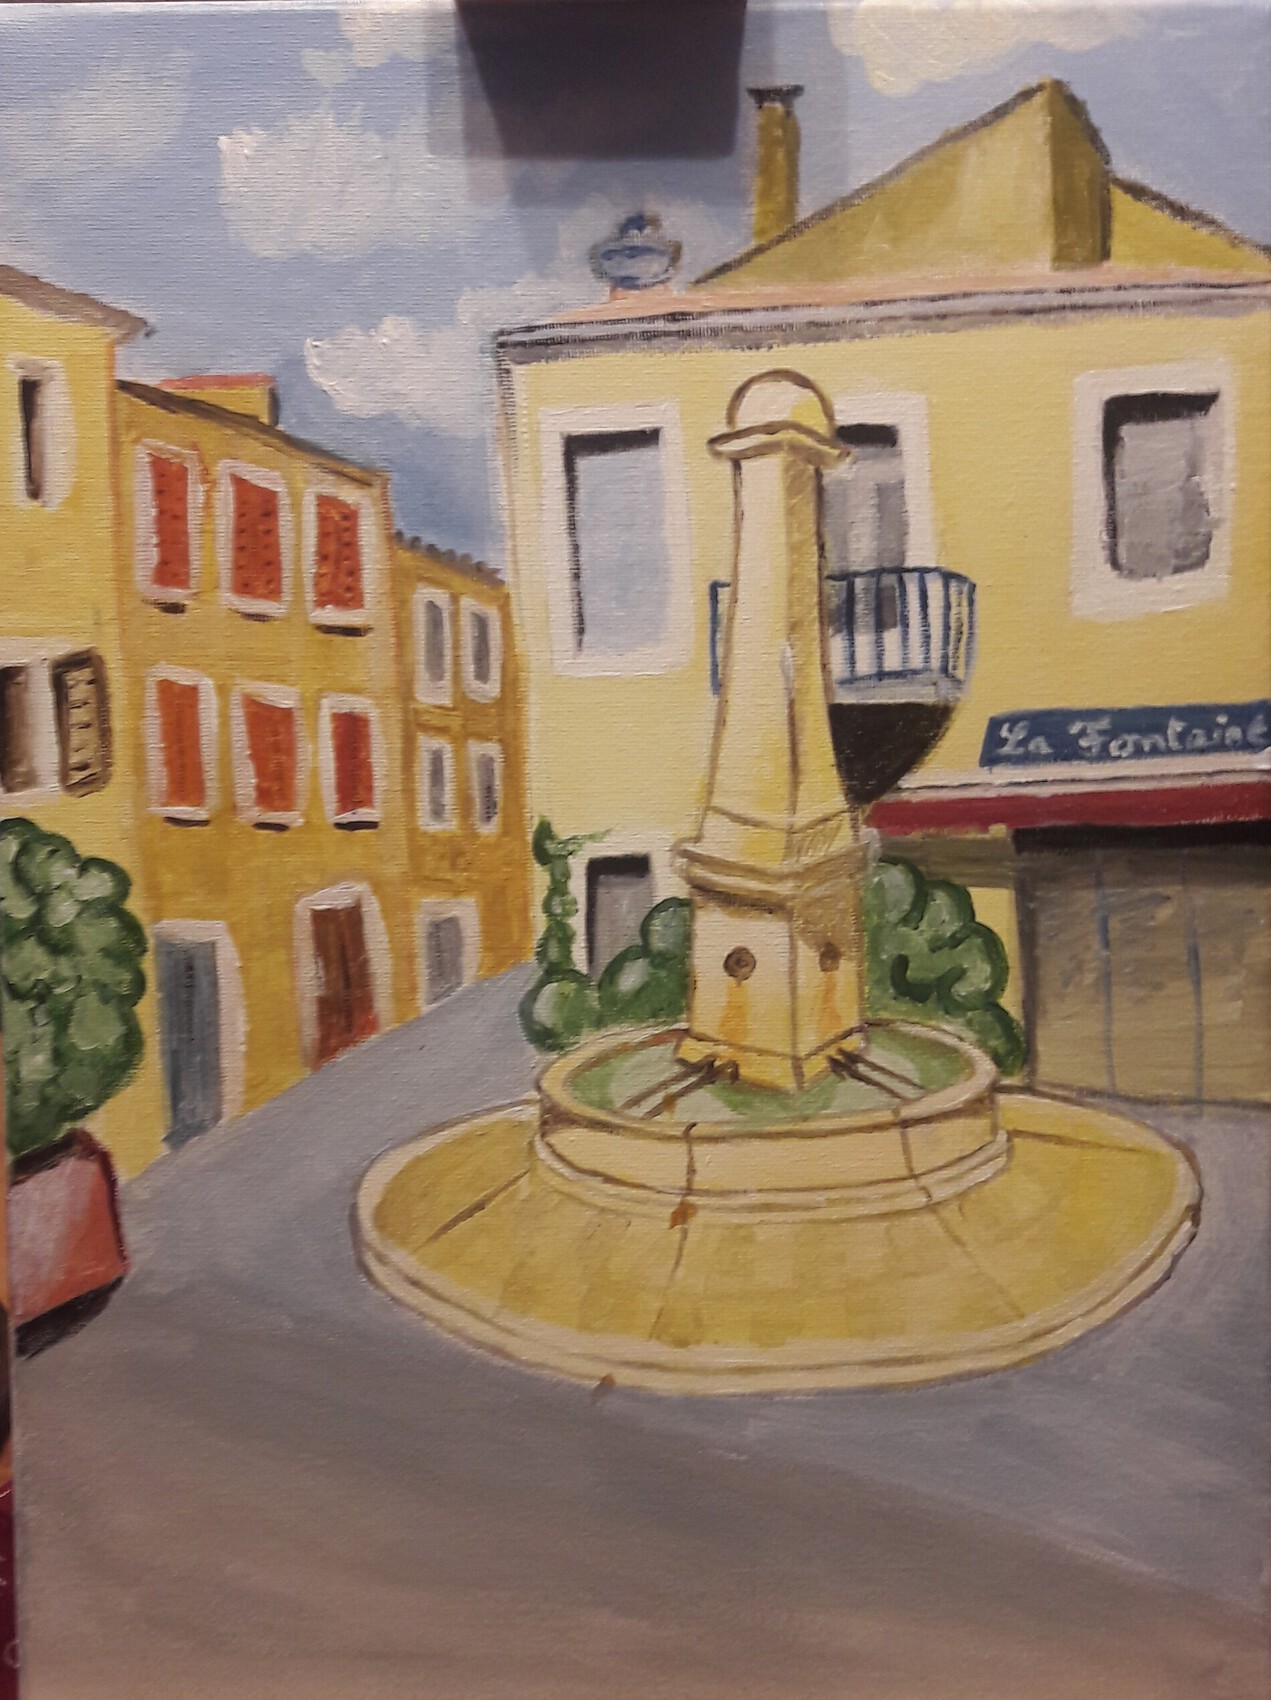 Fontaine salon de provence